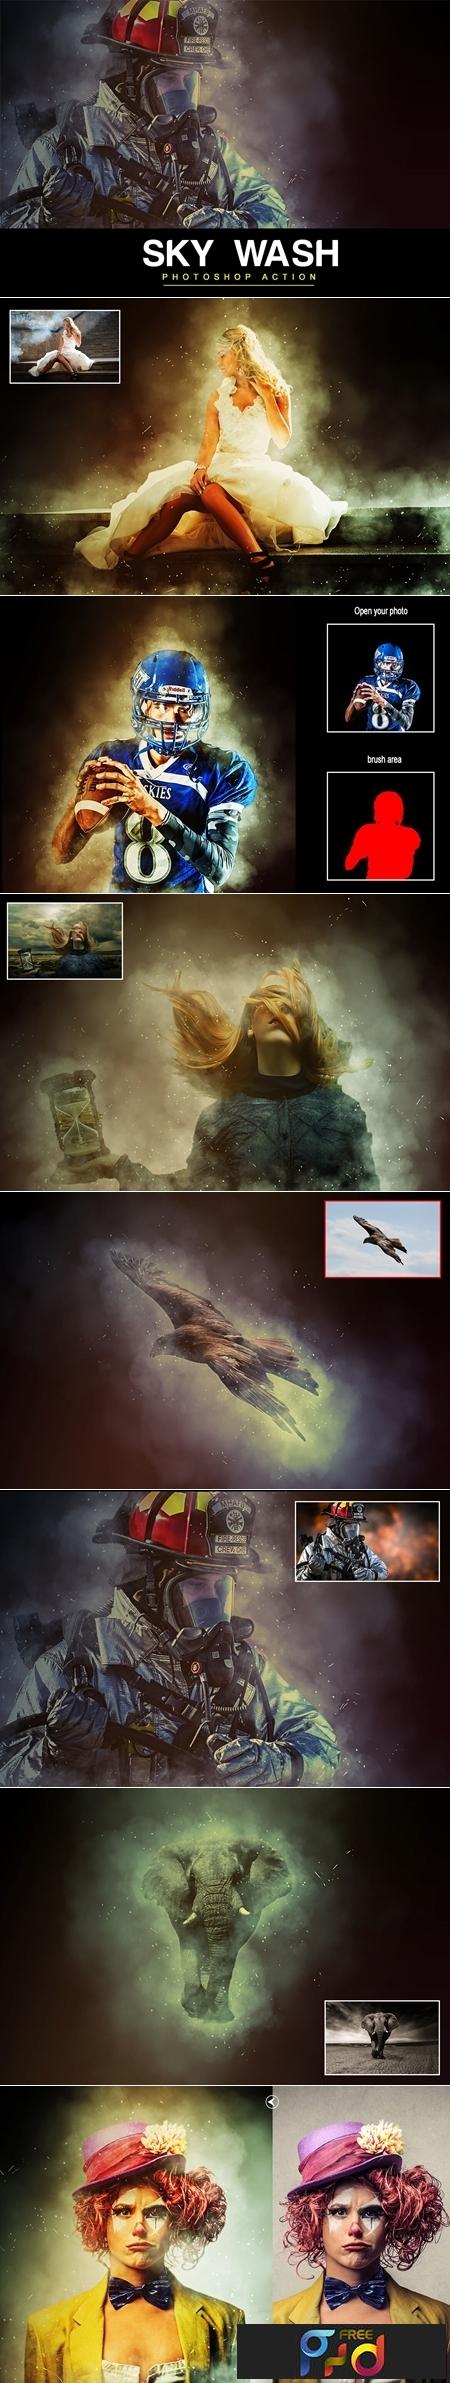 Sky Wash Photoshop Action 1